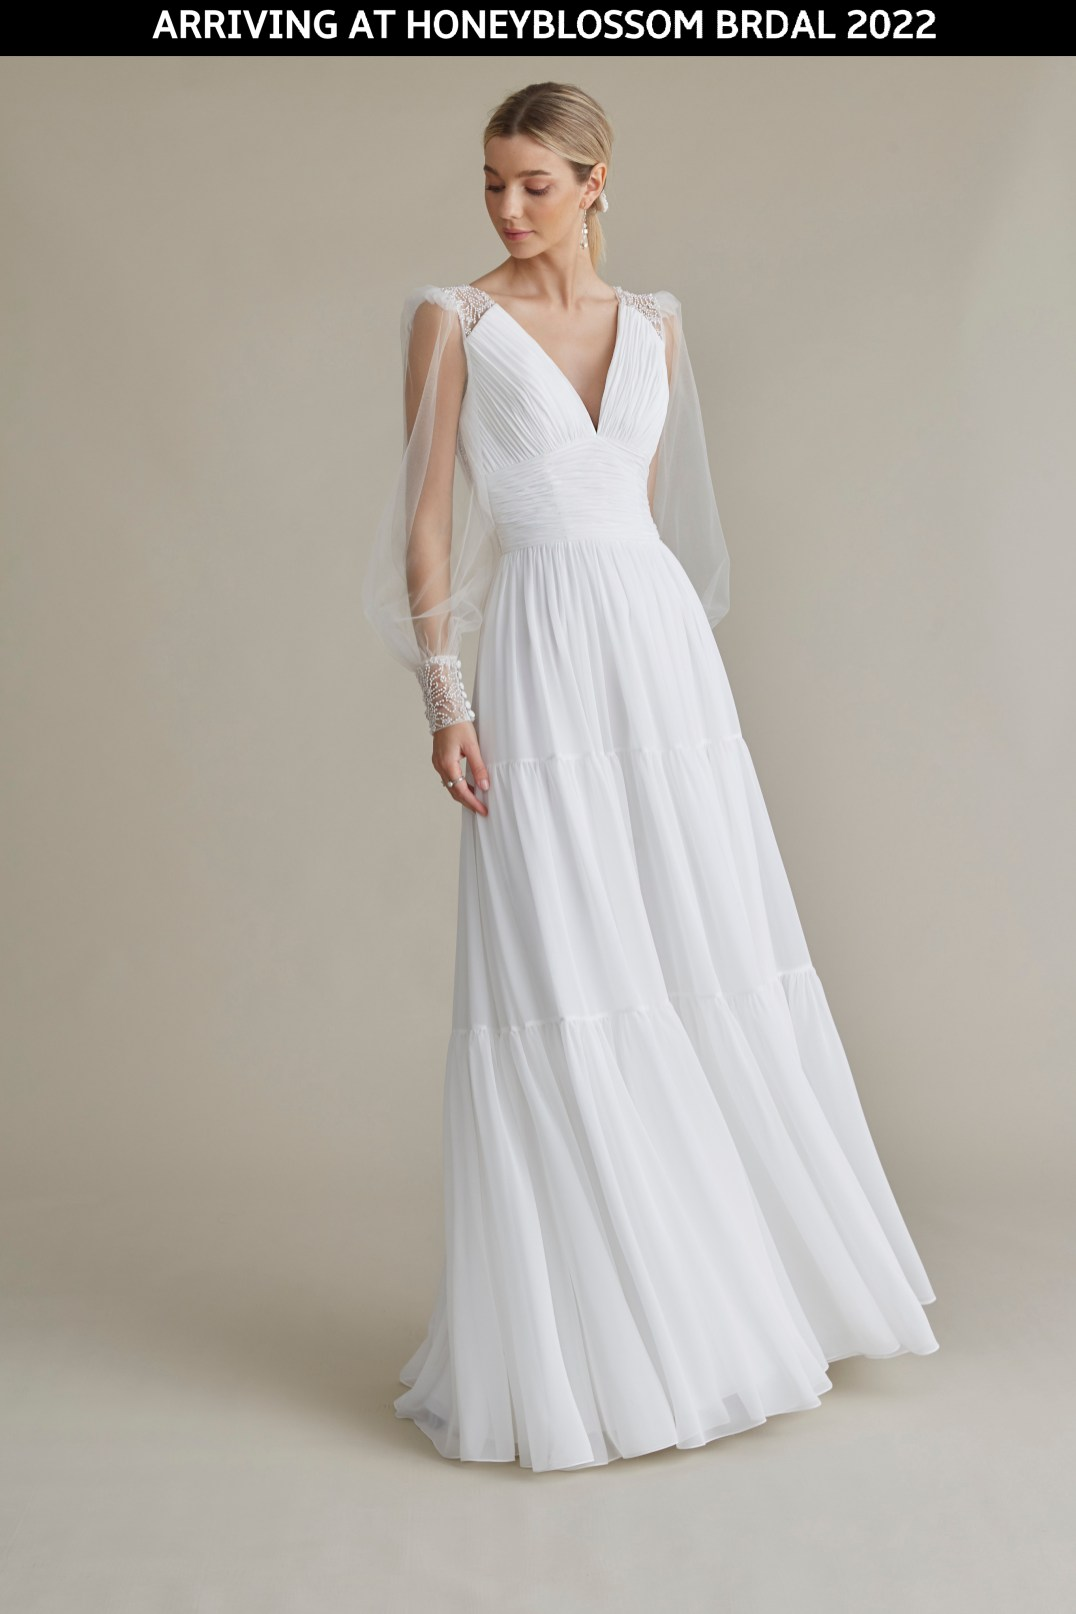 MiaMia Billie wedding dress arriving soon to Honeyblossom Bridal